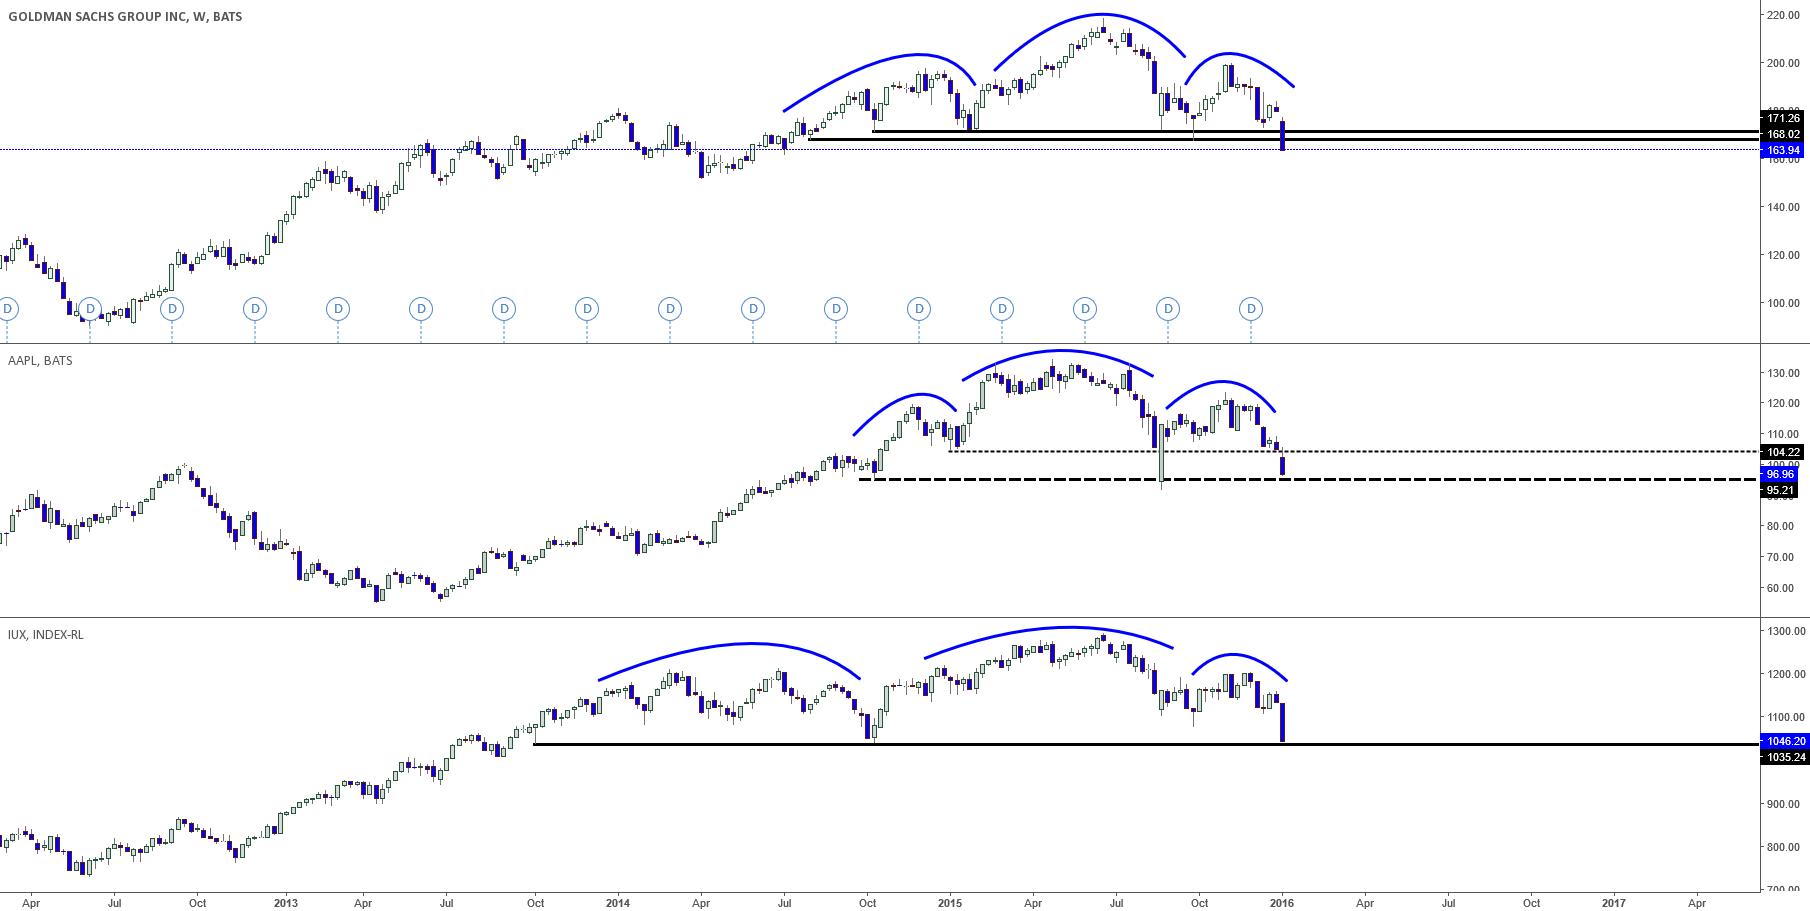 Goldman Sachs, Apple & Russell 2000 H & S Patterns!